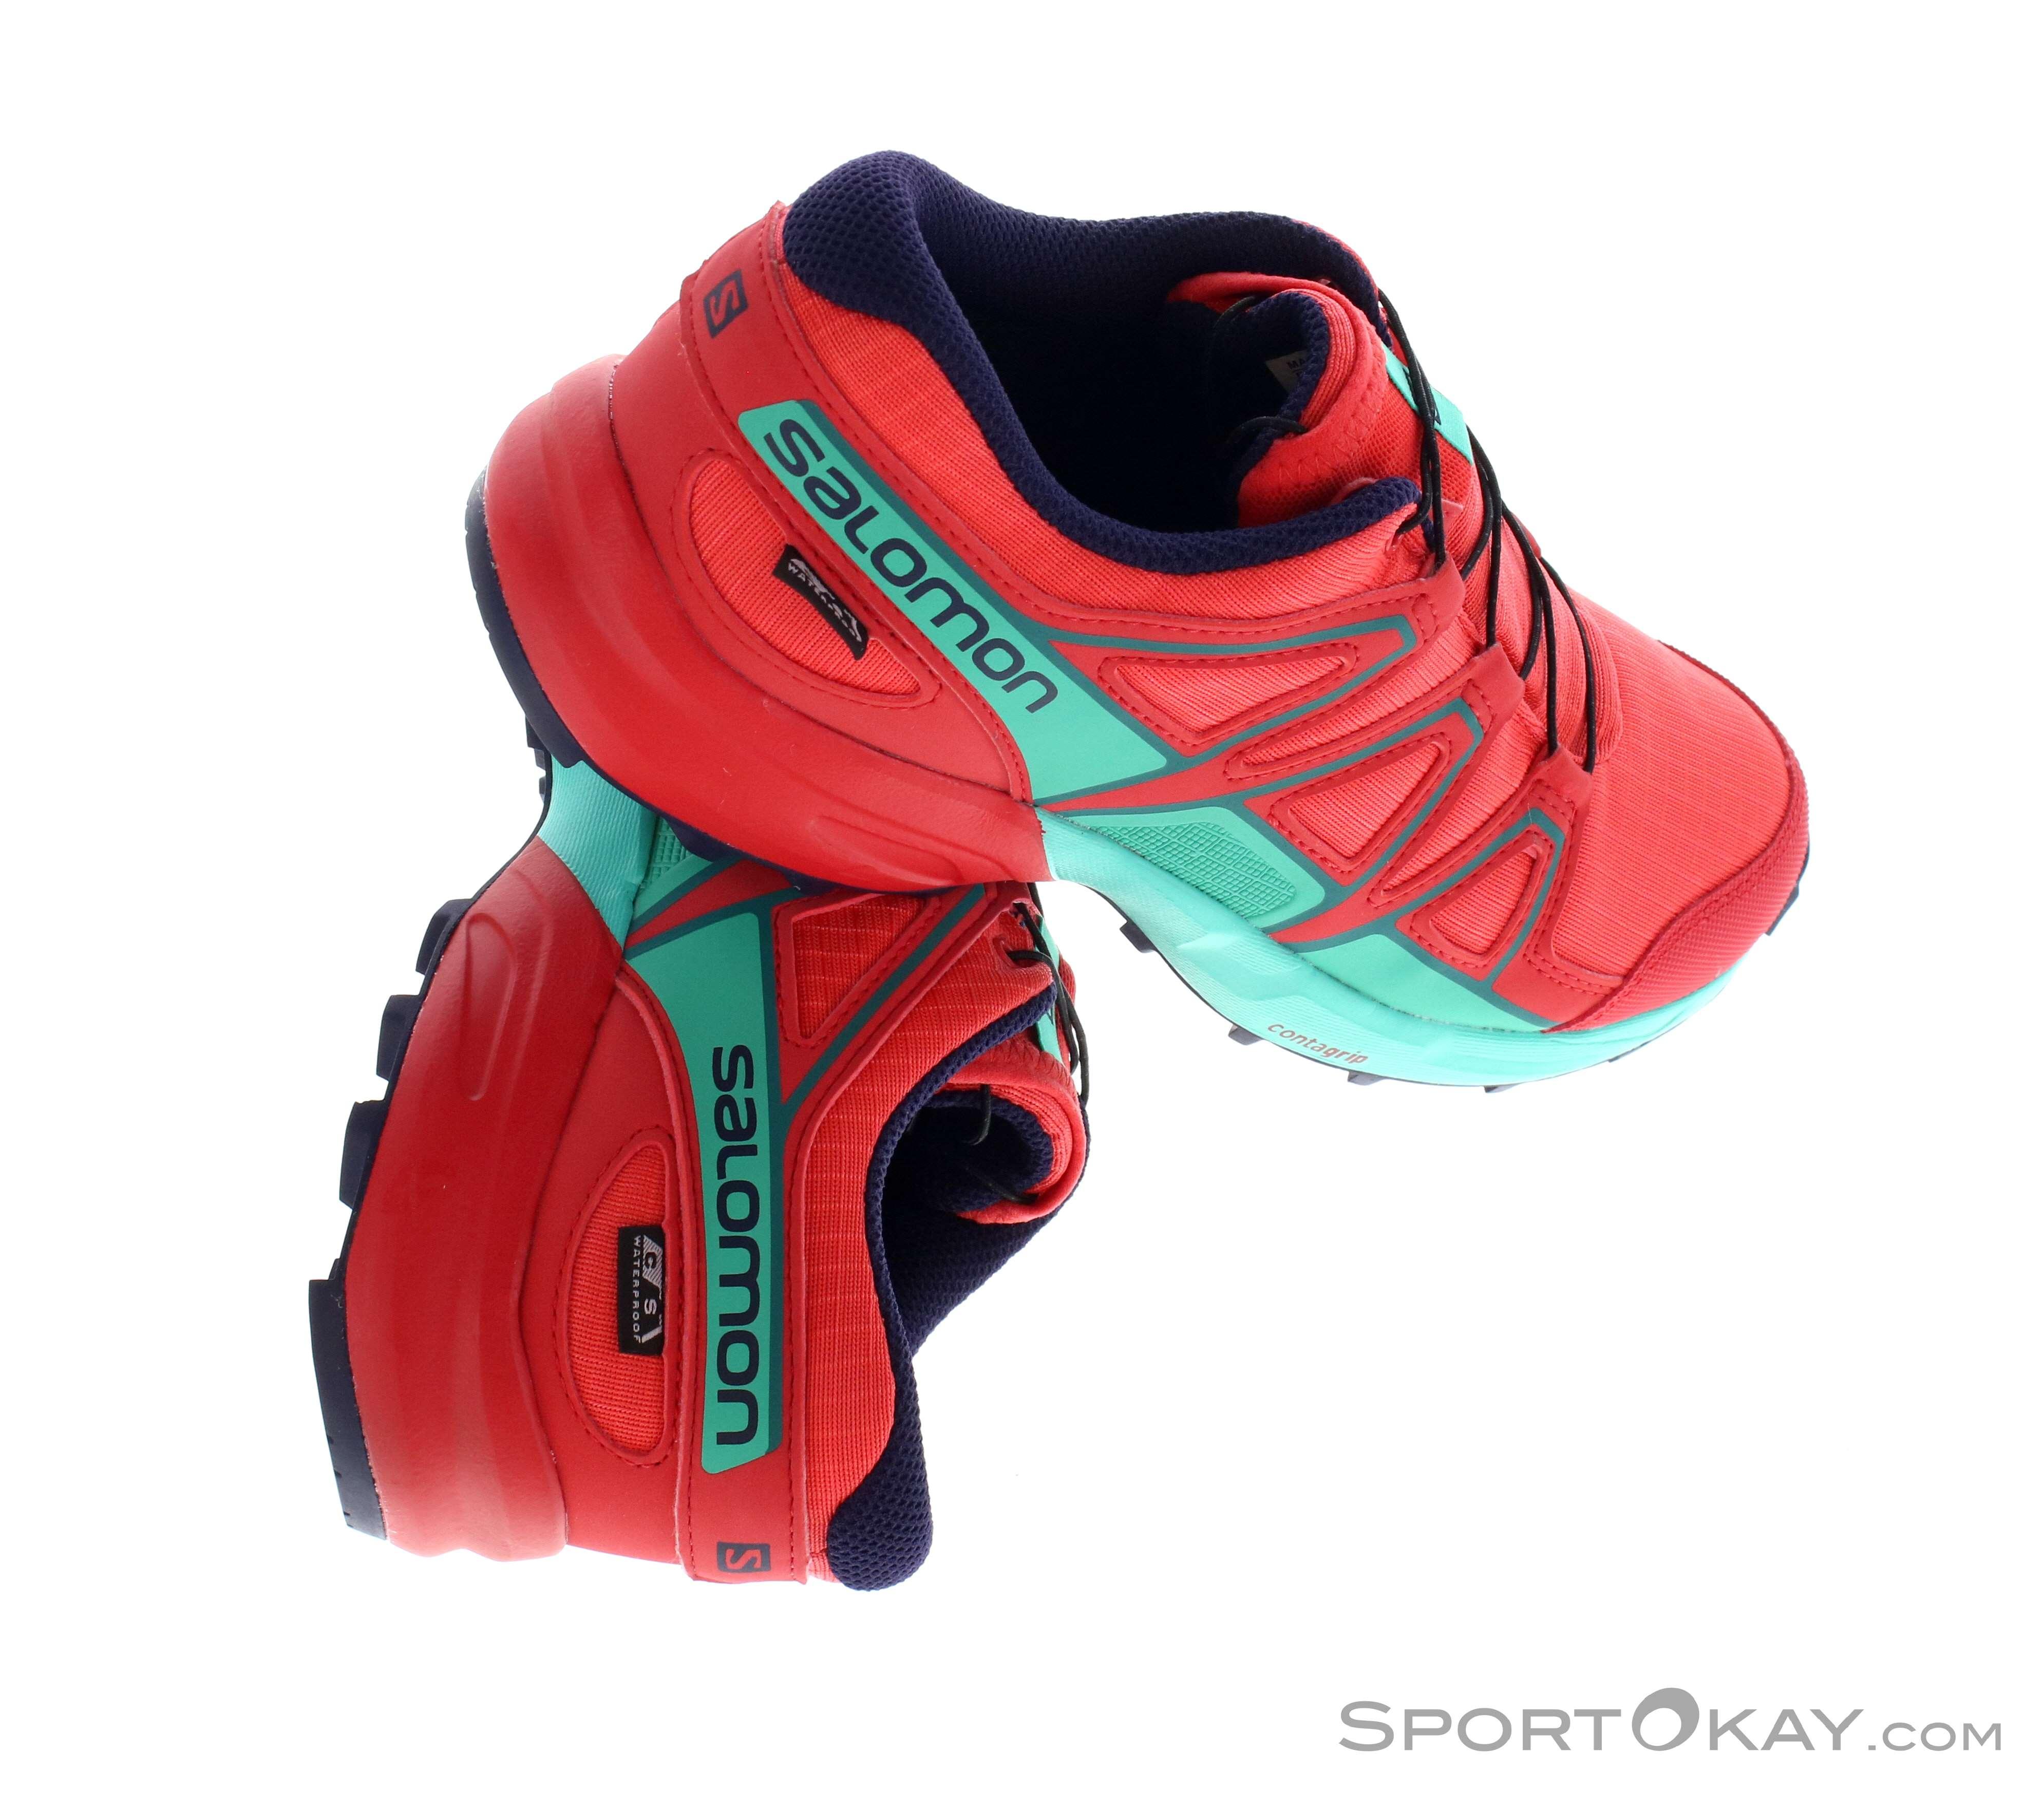 Salomon Speedcross CSWP J Bambini Scarpe da Trail Running - Scarpe ... b443360df81